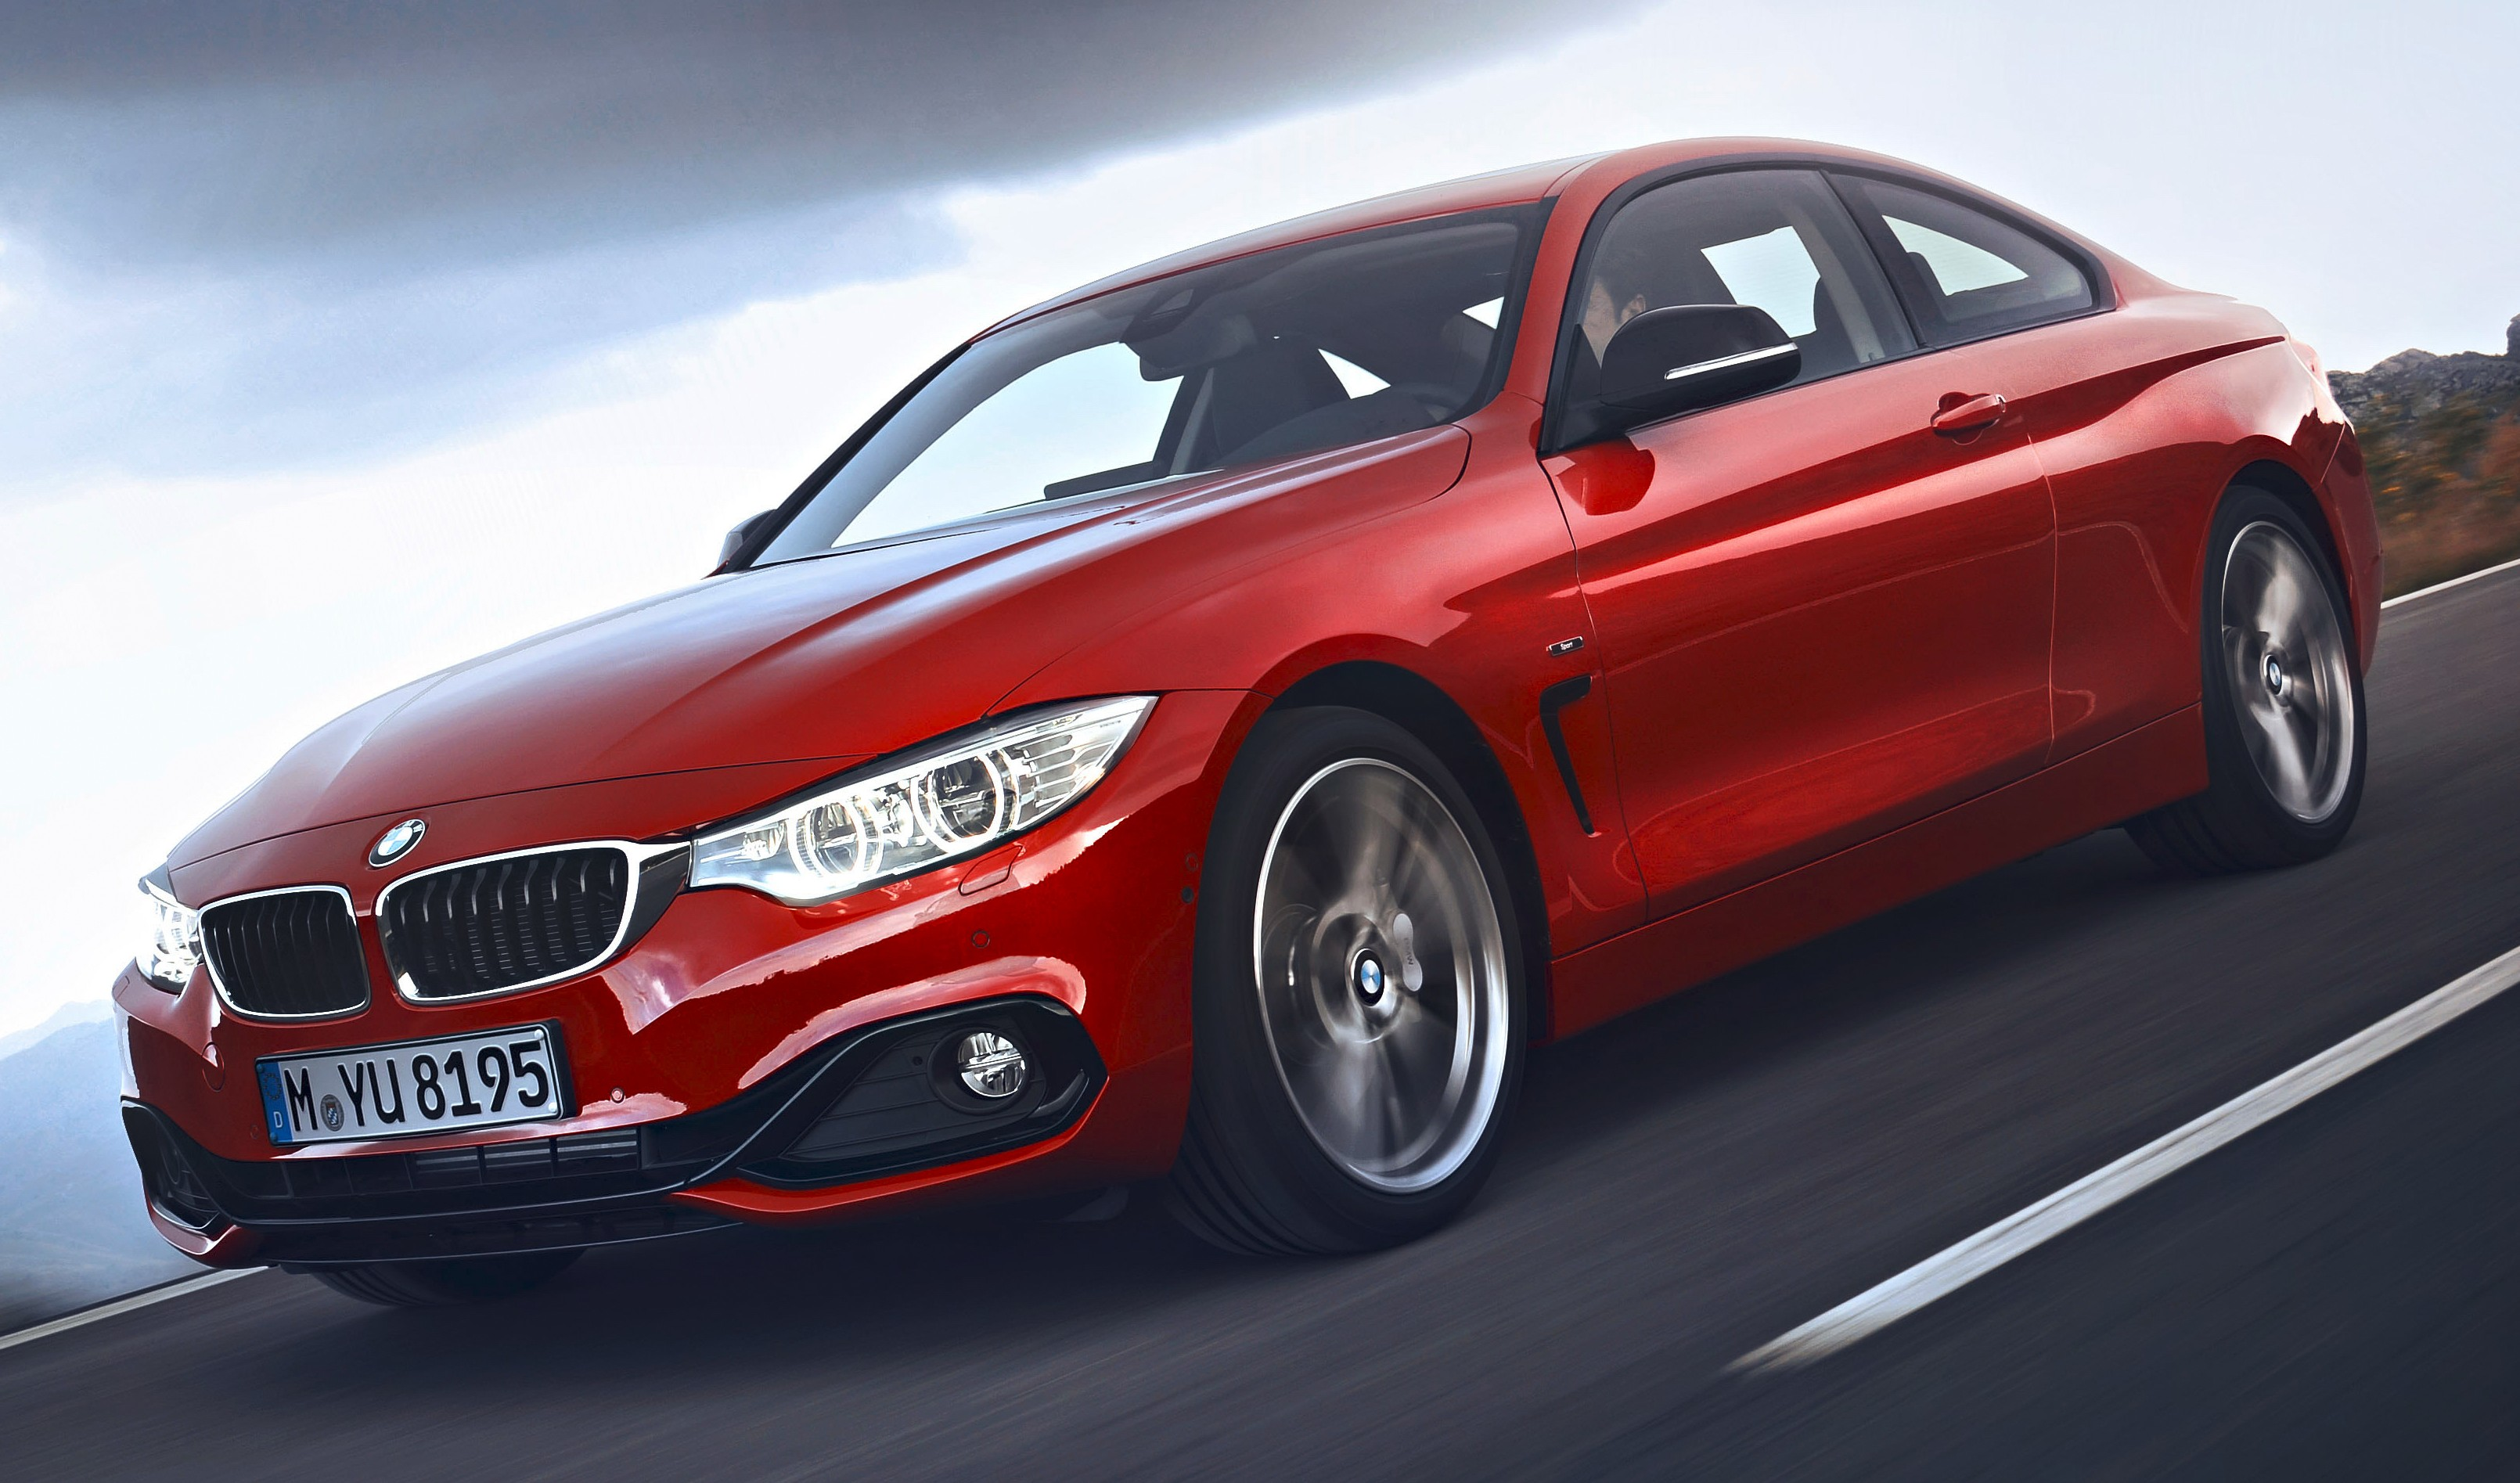 bmw 2015 i8 red. bmw 2 series 3 4 get new engines u2013 5 bmw 2015 i8 red i